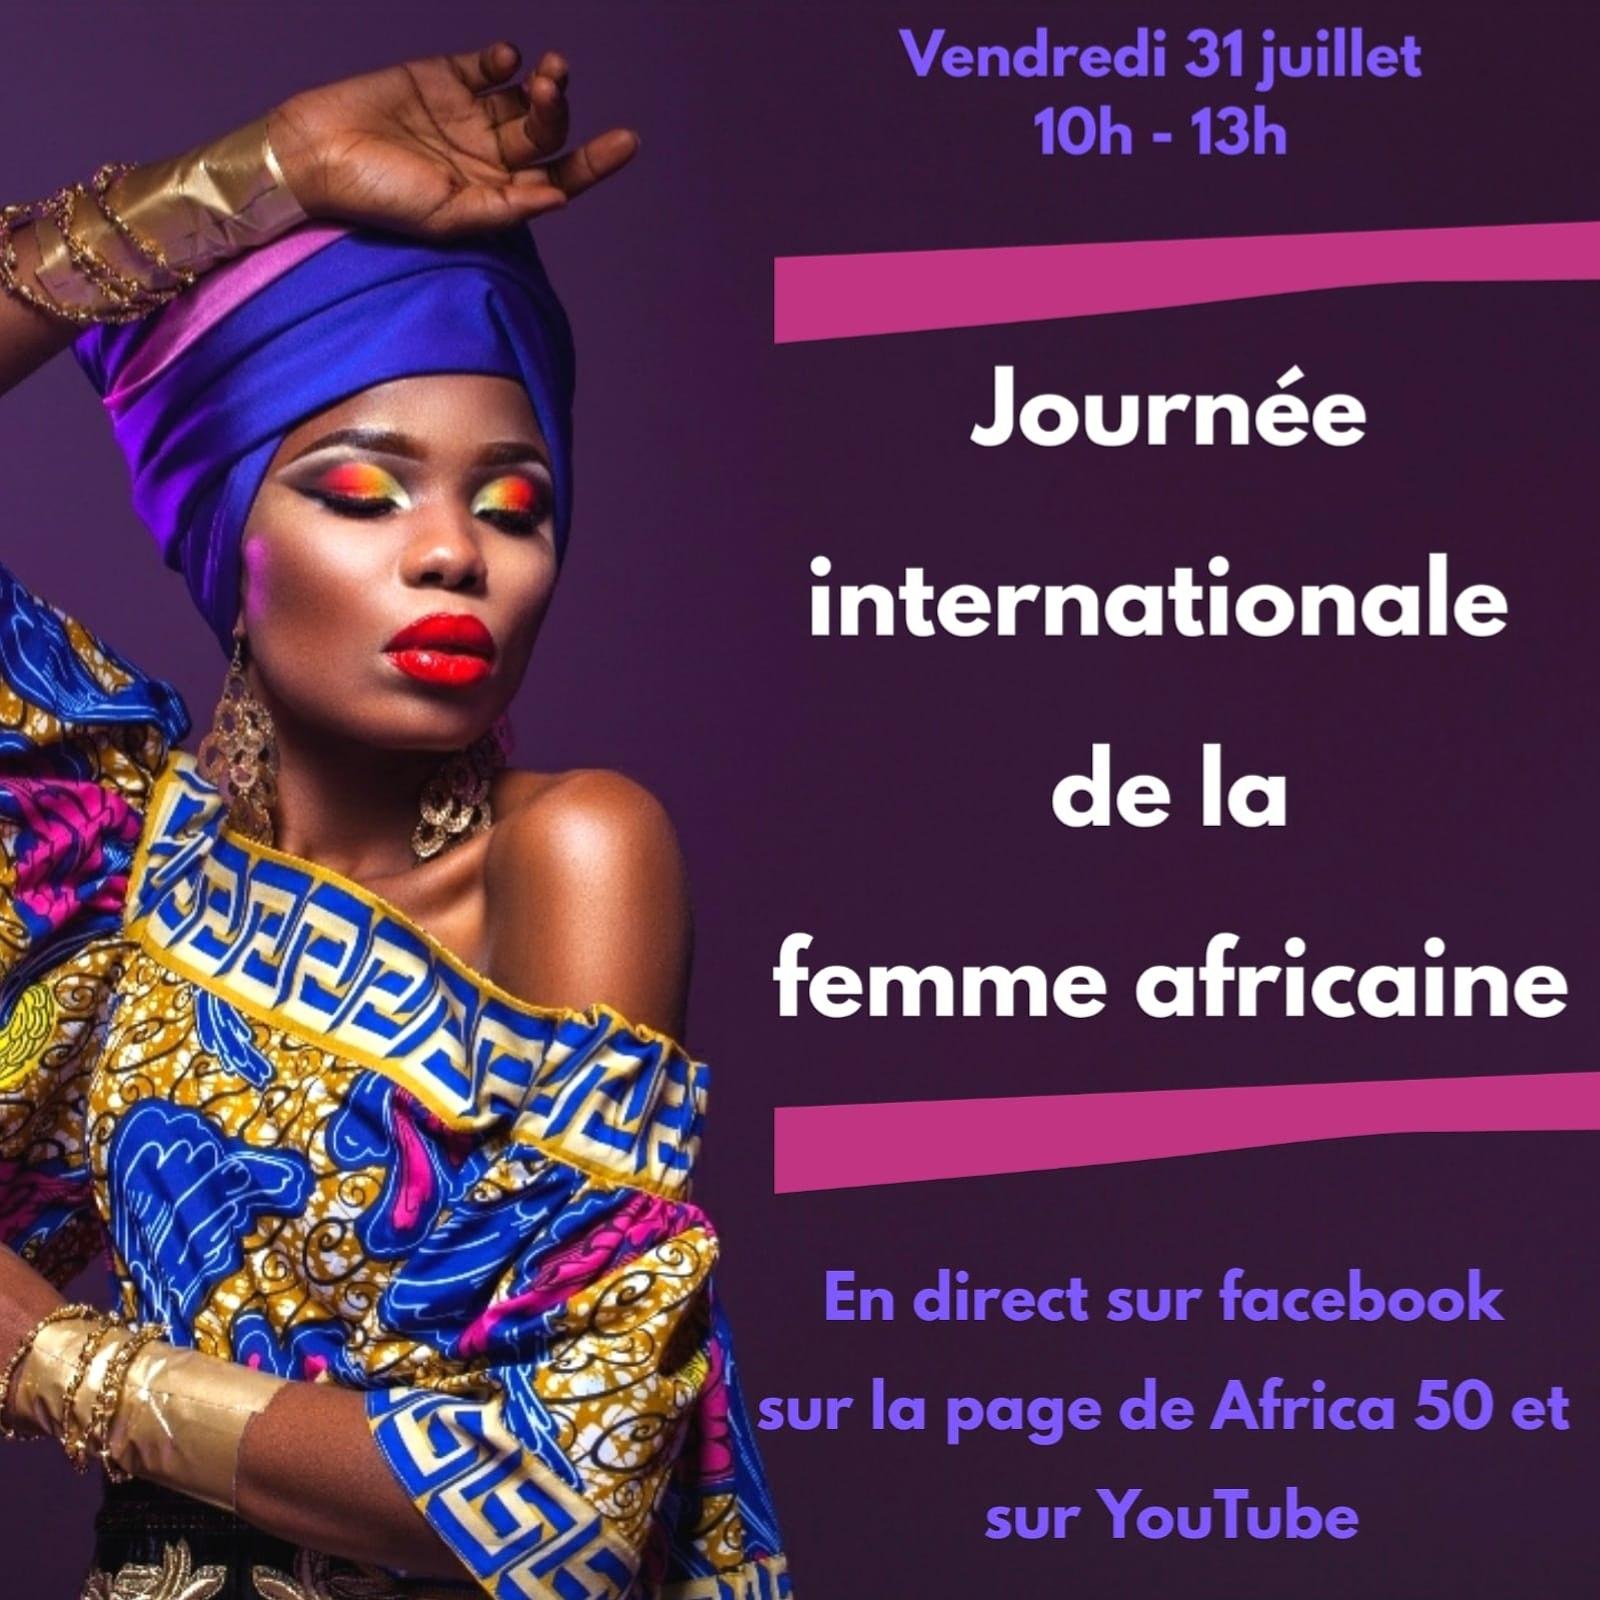 [FEMMES] Visio-Conférence : Journée Internationale de la Femme Africaine Vendredi 31 juillet 2020